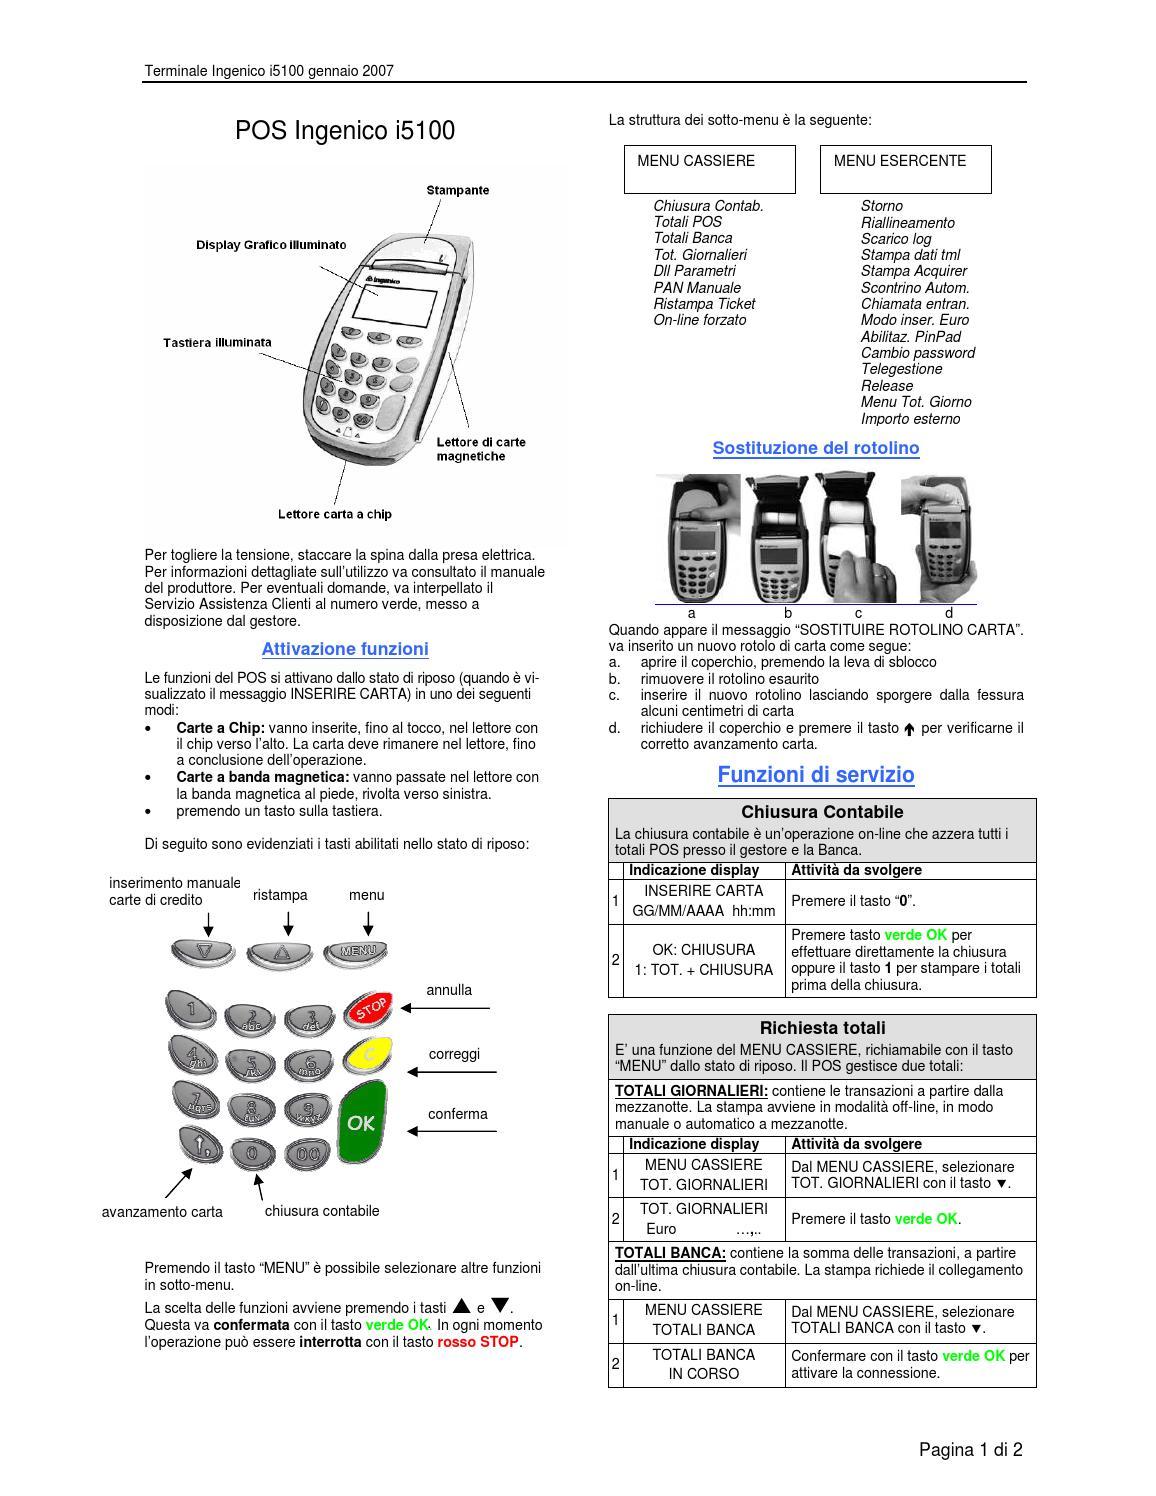 Ingenico I5100 Manuale Istruzioni